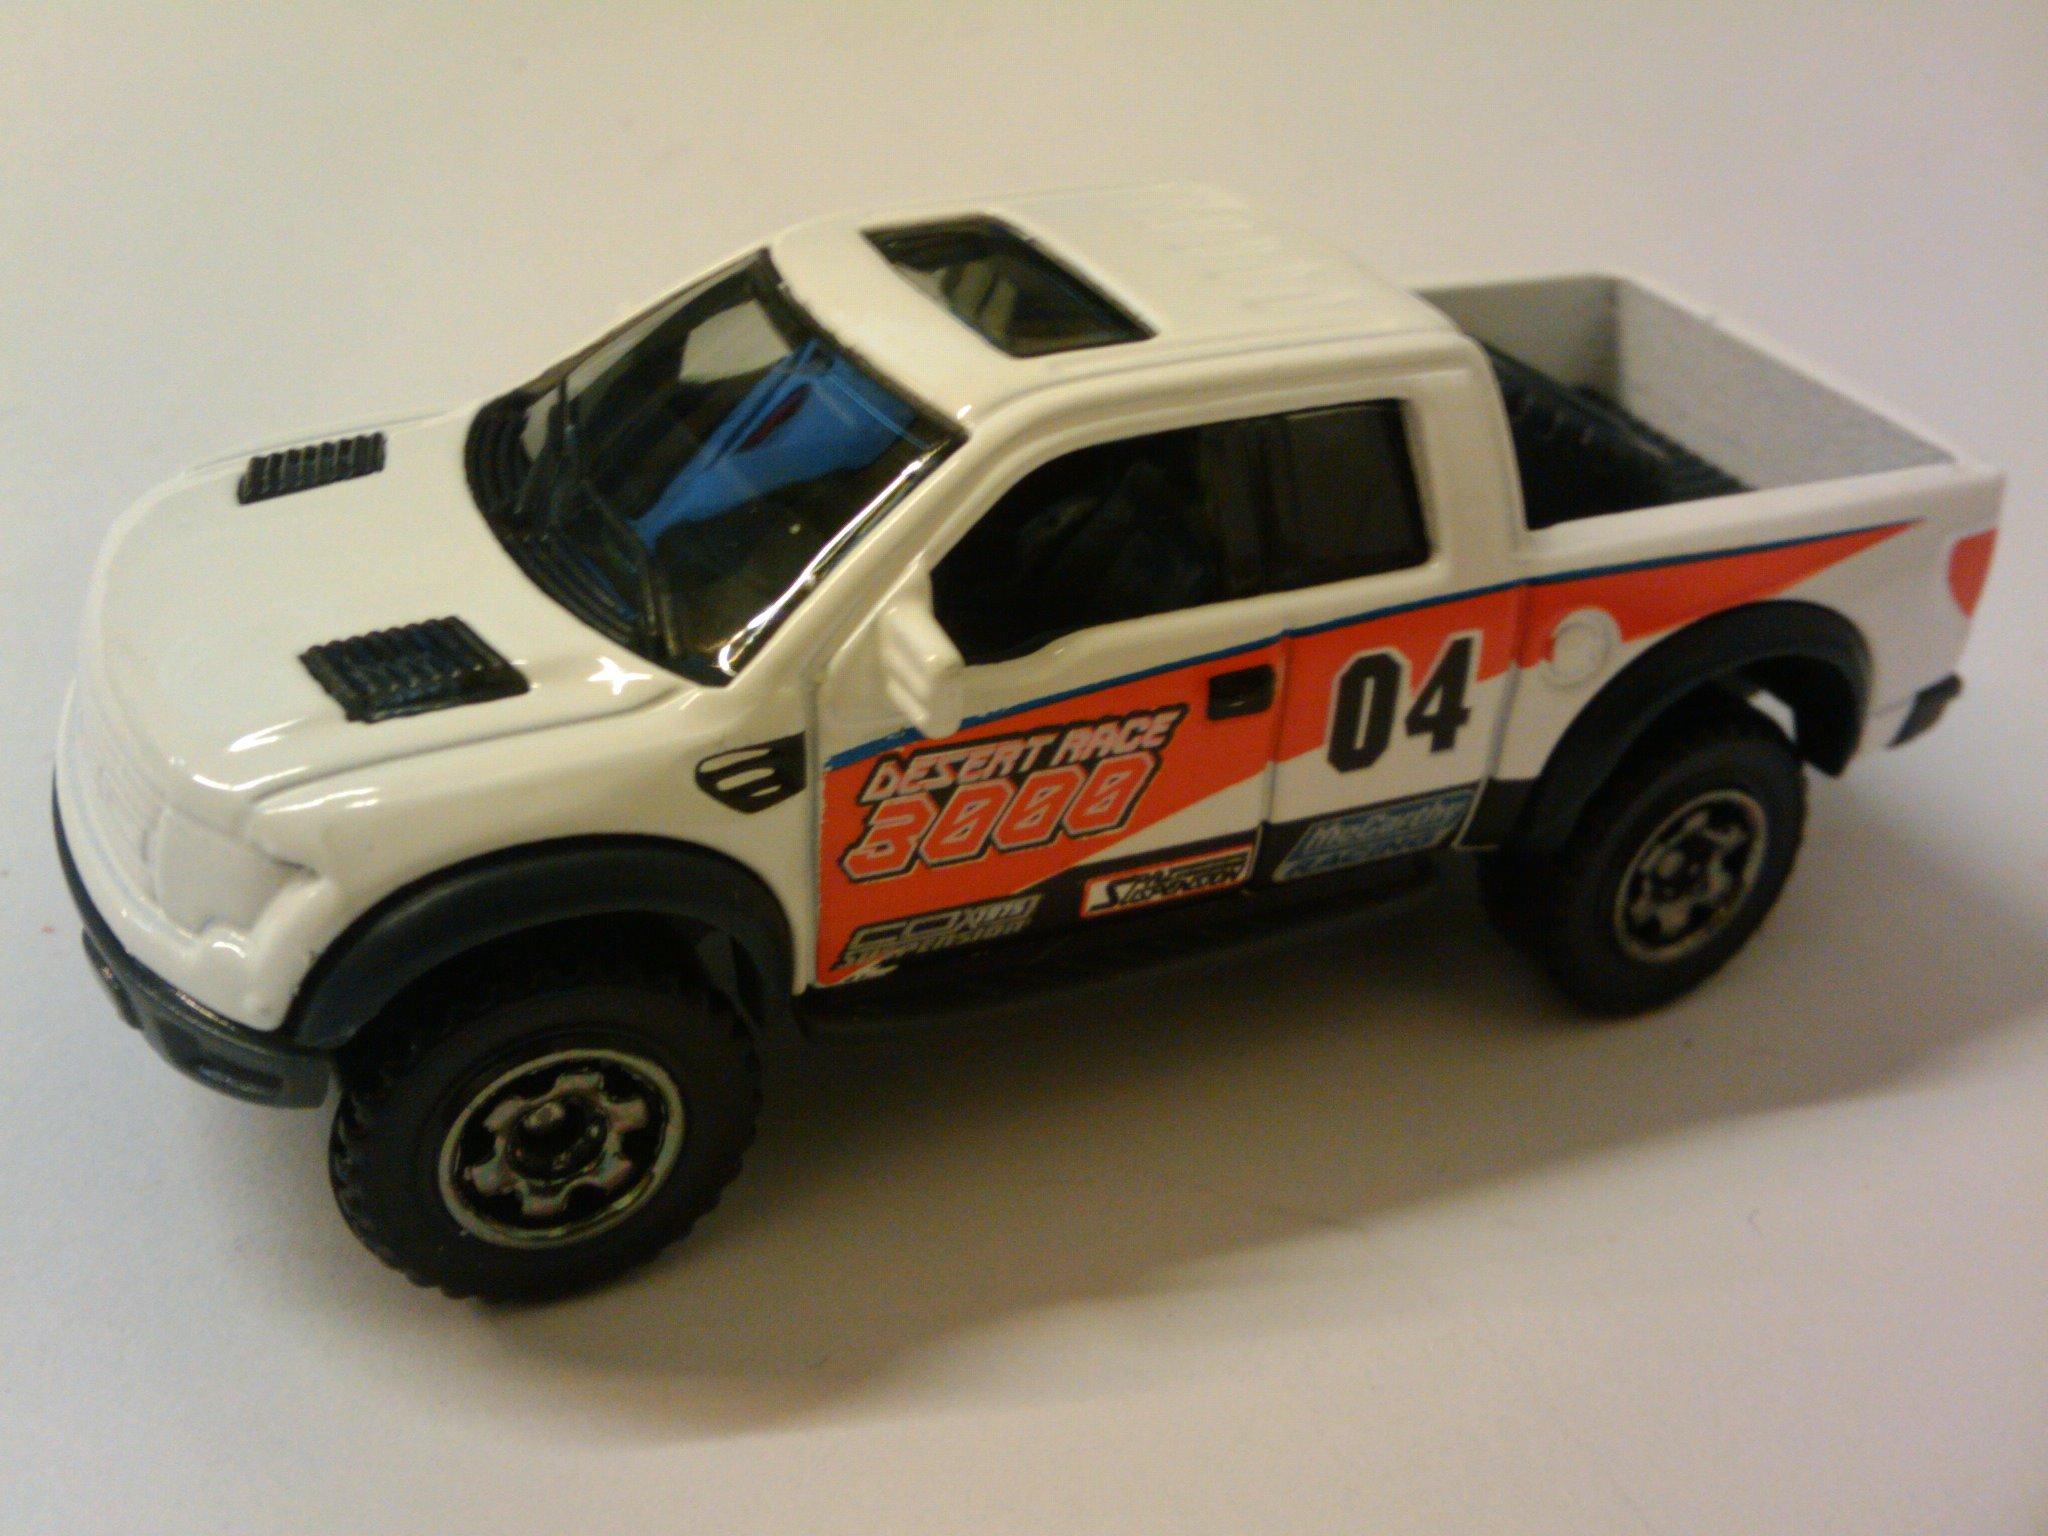 Ford F-150 SVT Raptor (2010) - Matchbox Cars Wiki